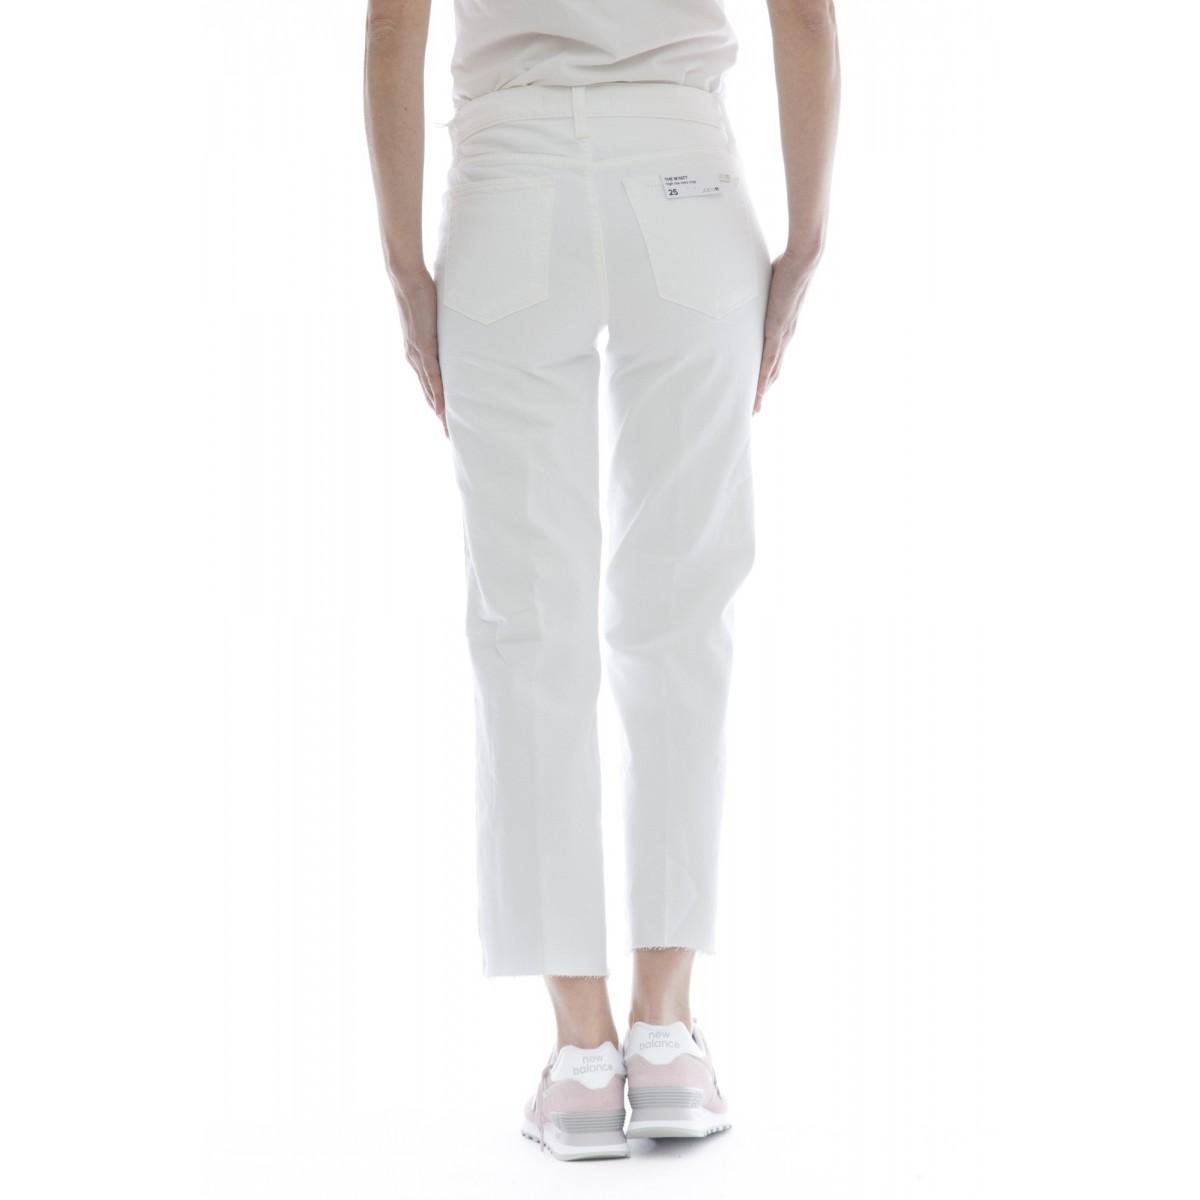 Jeans - The wyatt hr crop gamba larga dritto